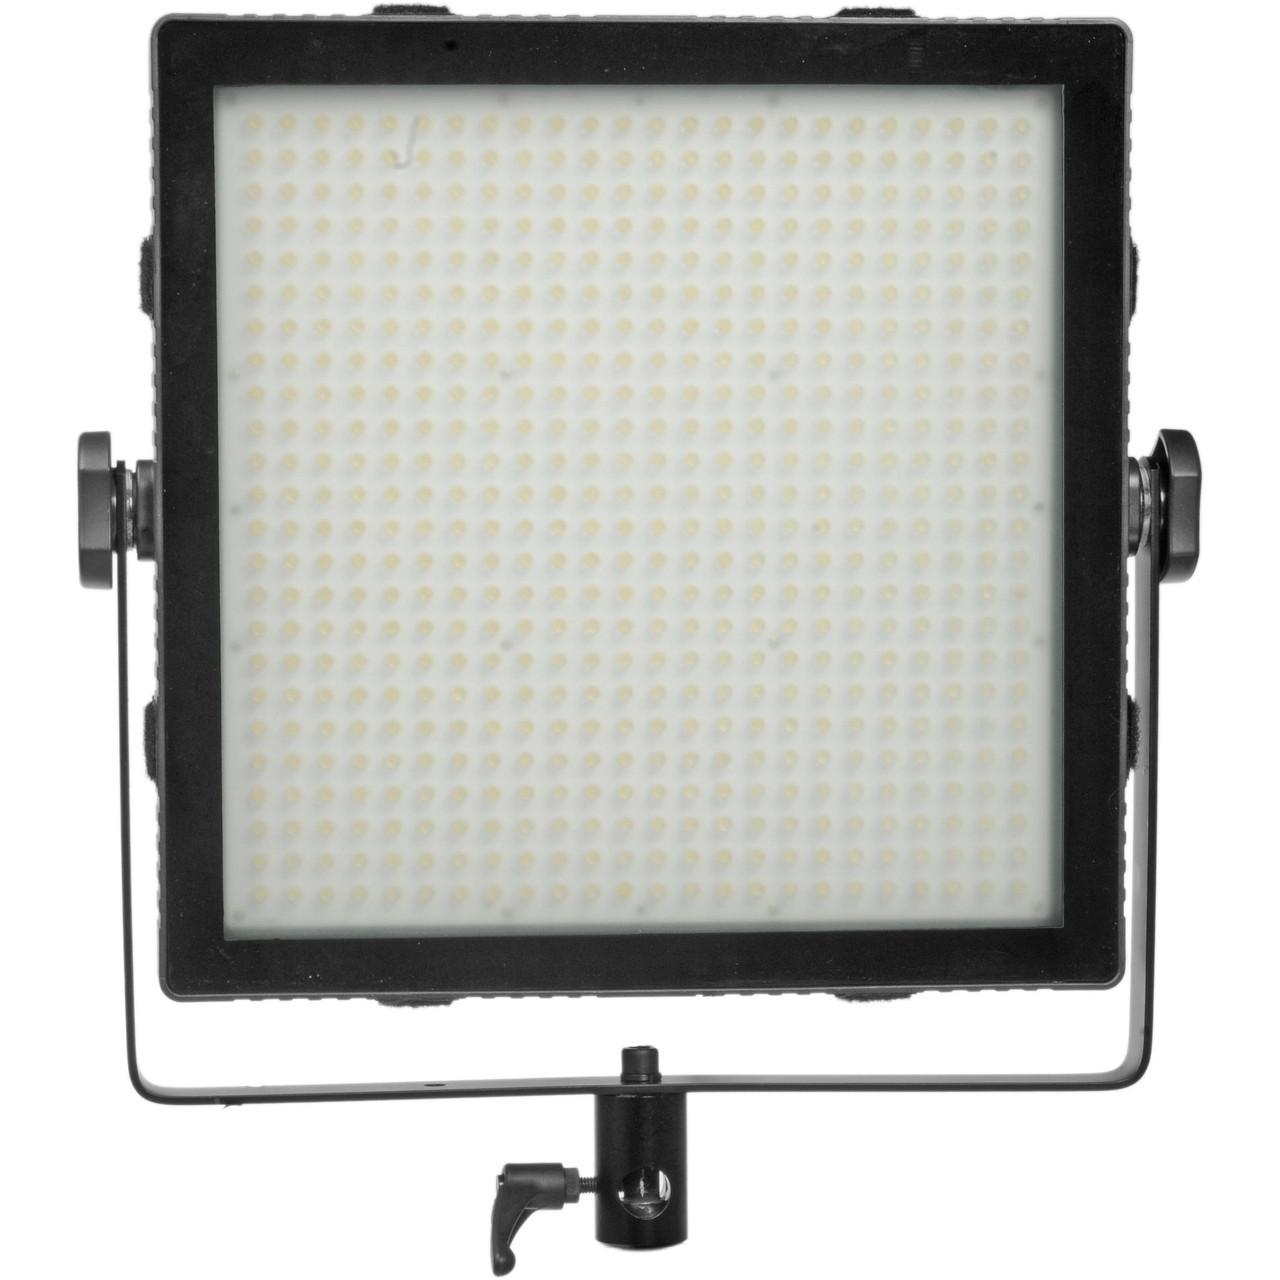 Dedolight Felloni Tecpro 15 Degree Standard Tungsten LED Light (TP-LONI-T15)